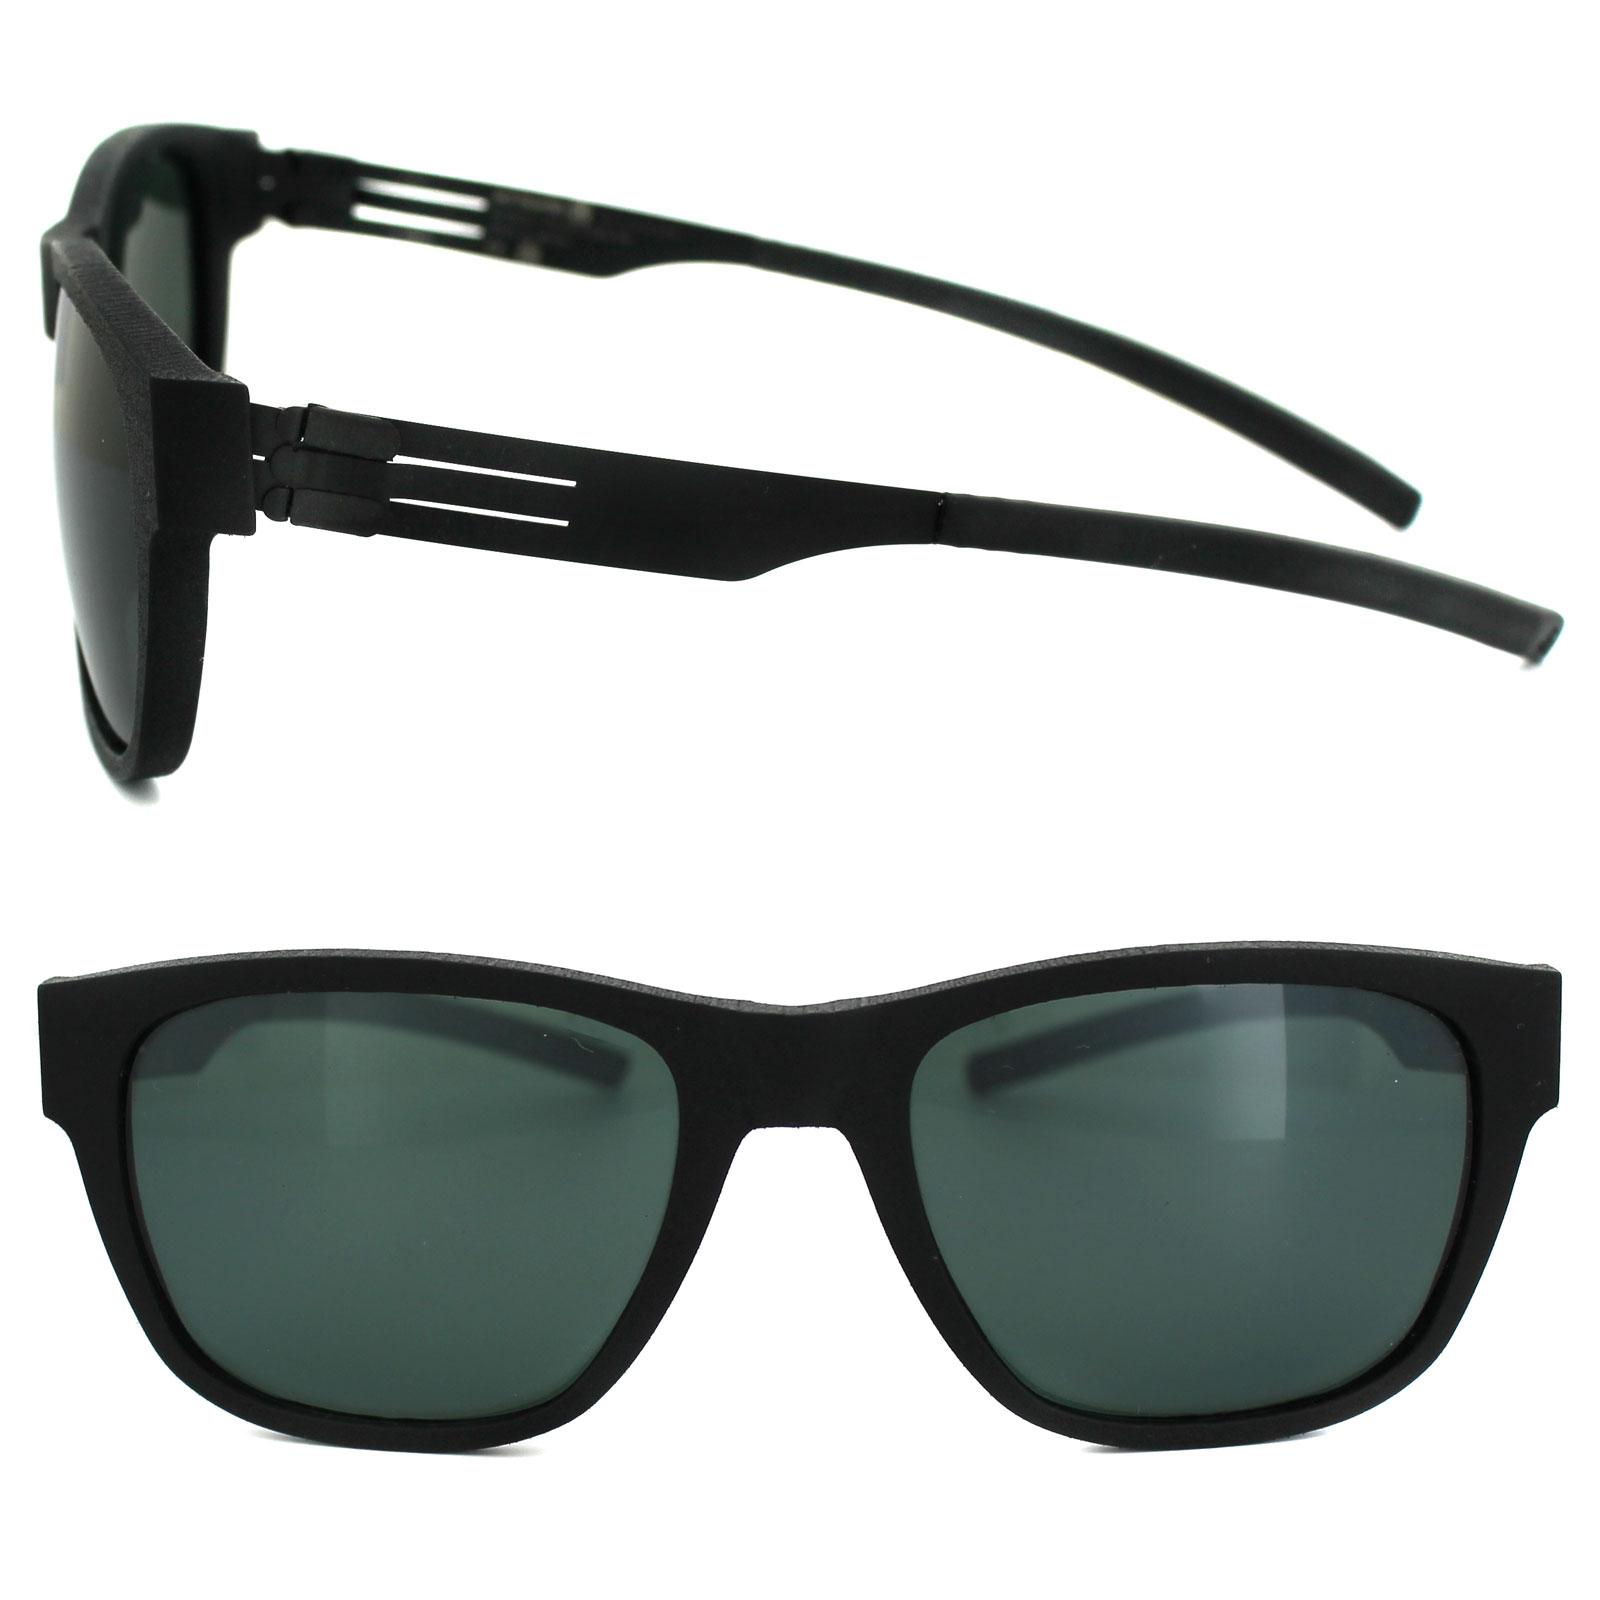 Cheap Ic Berlin Rapo 2 Sunglasses Discounted Sunglasses